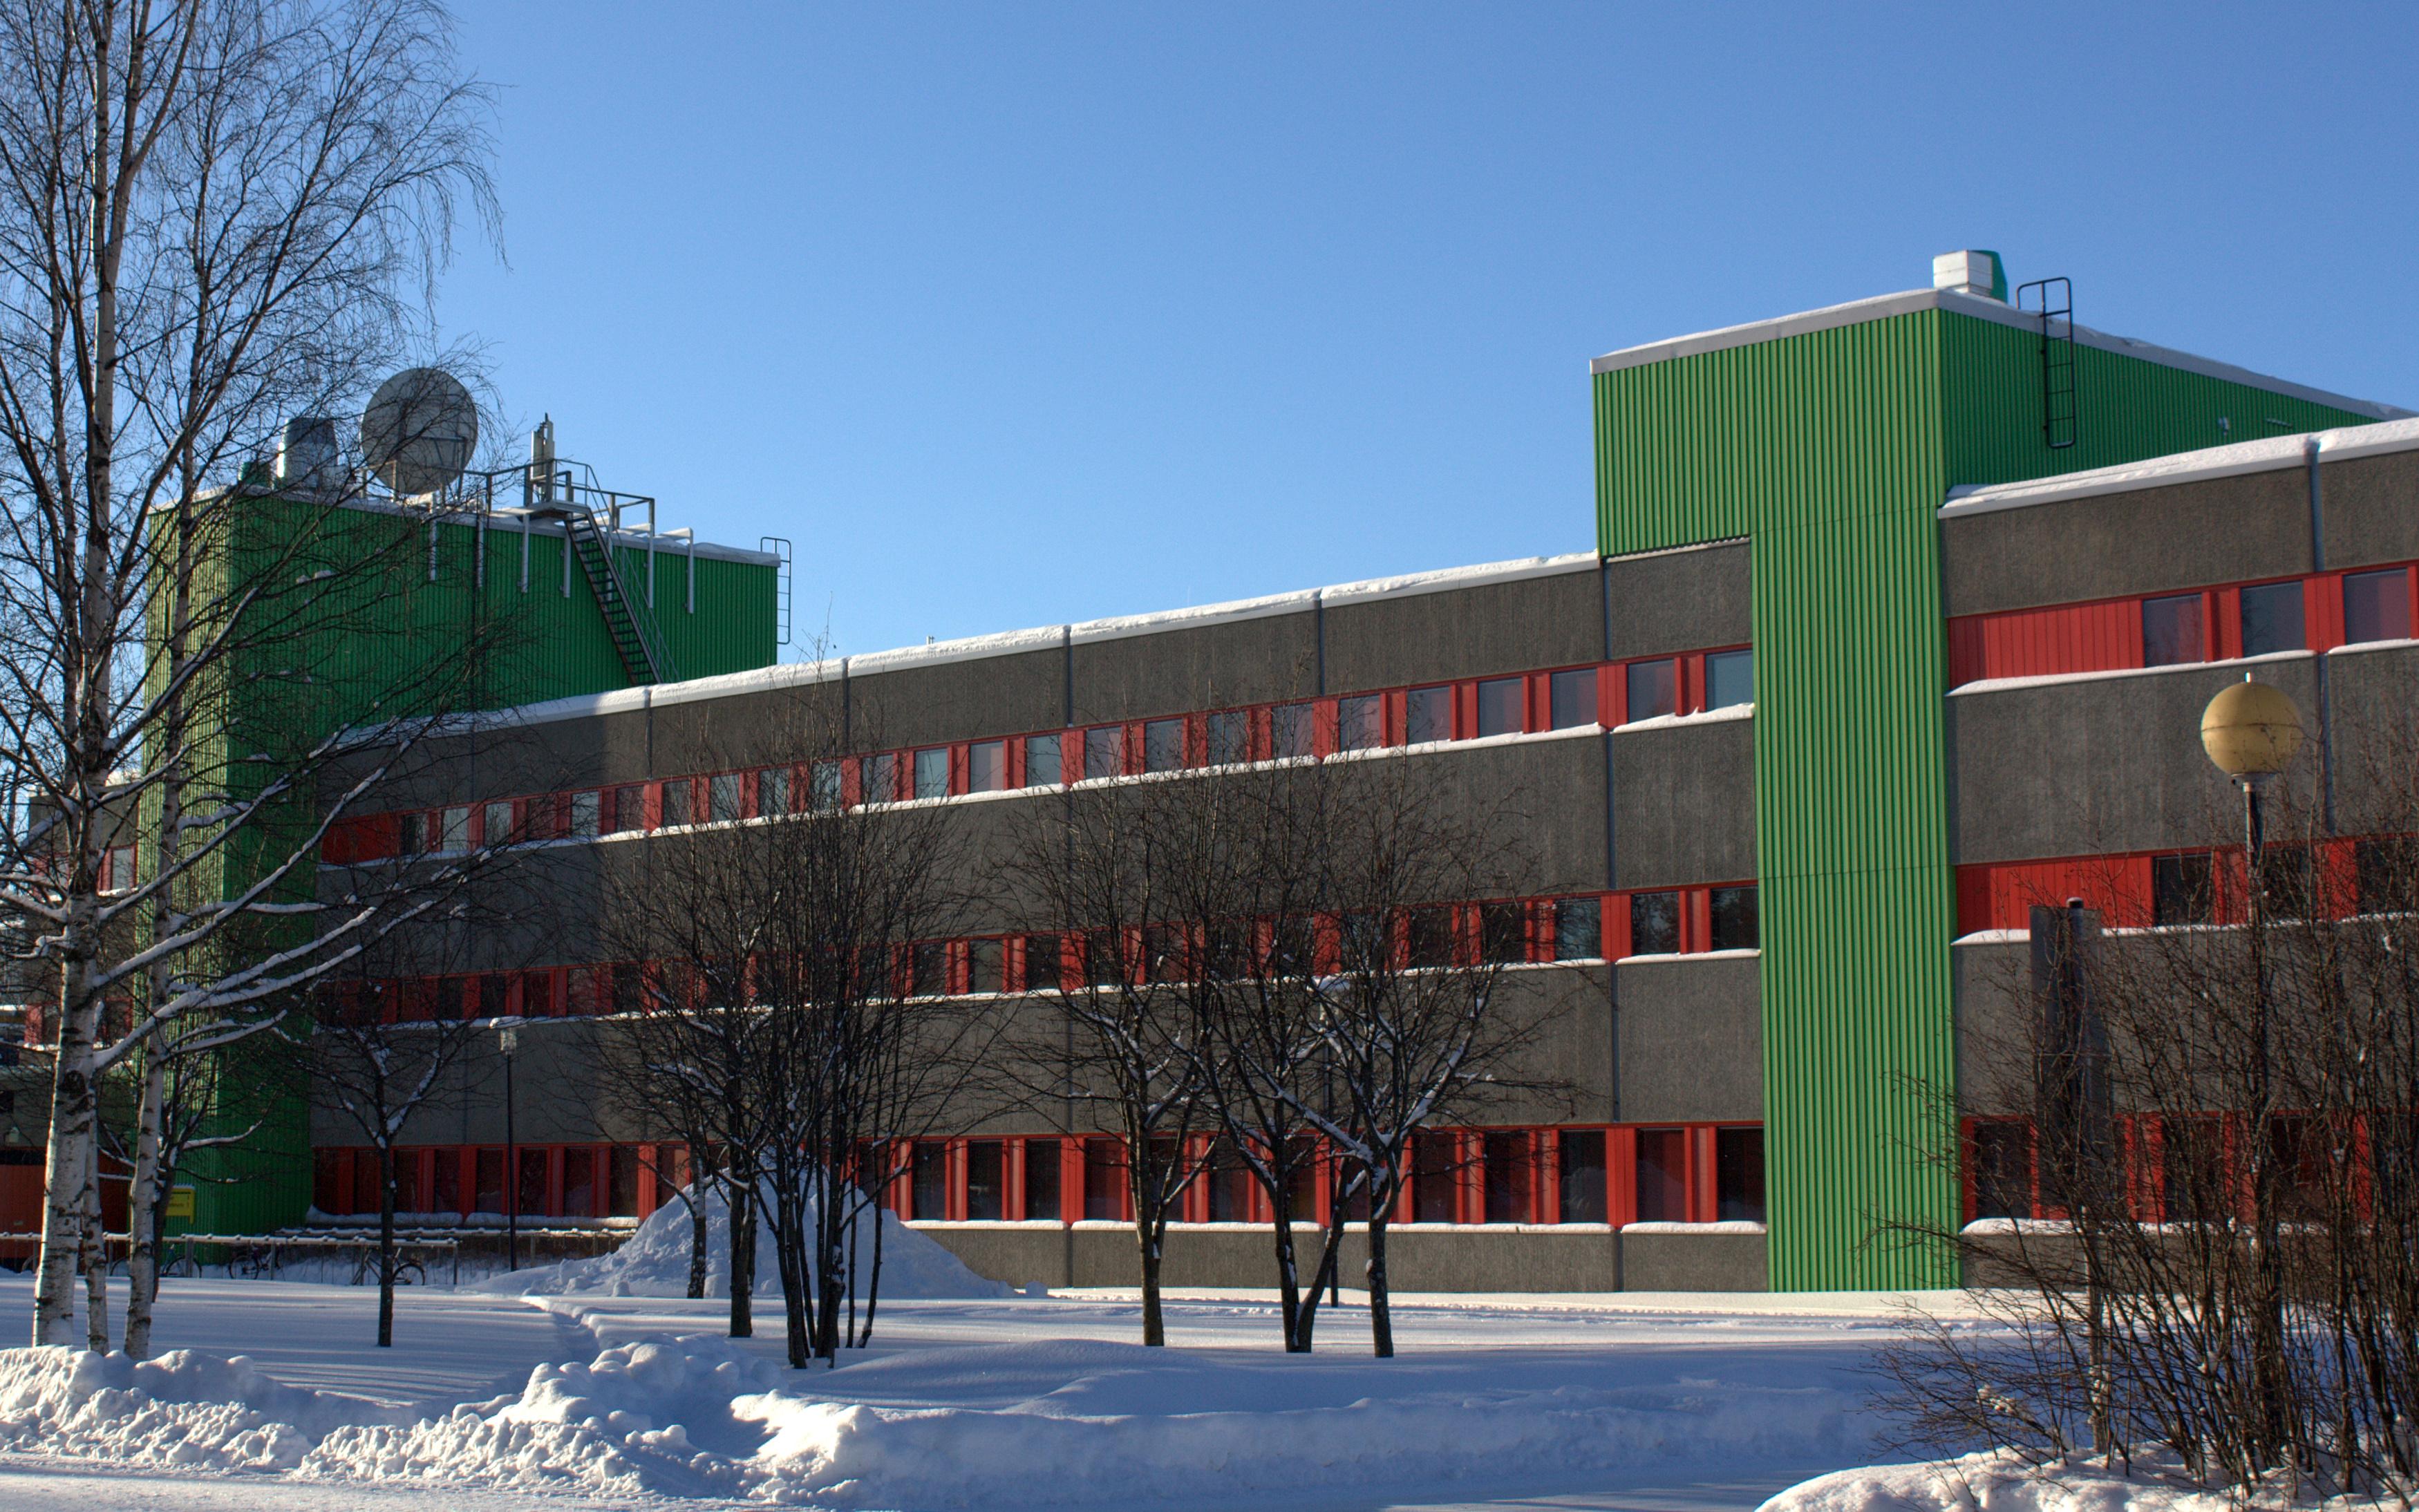 File:Oulu University Economics and Business Administration 20100213.jpg - Wikimedia Commons